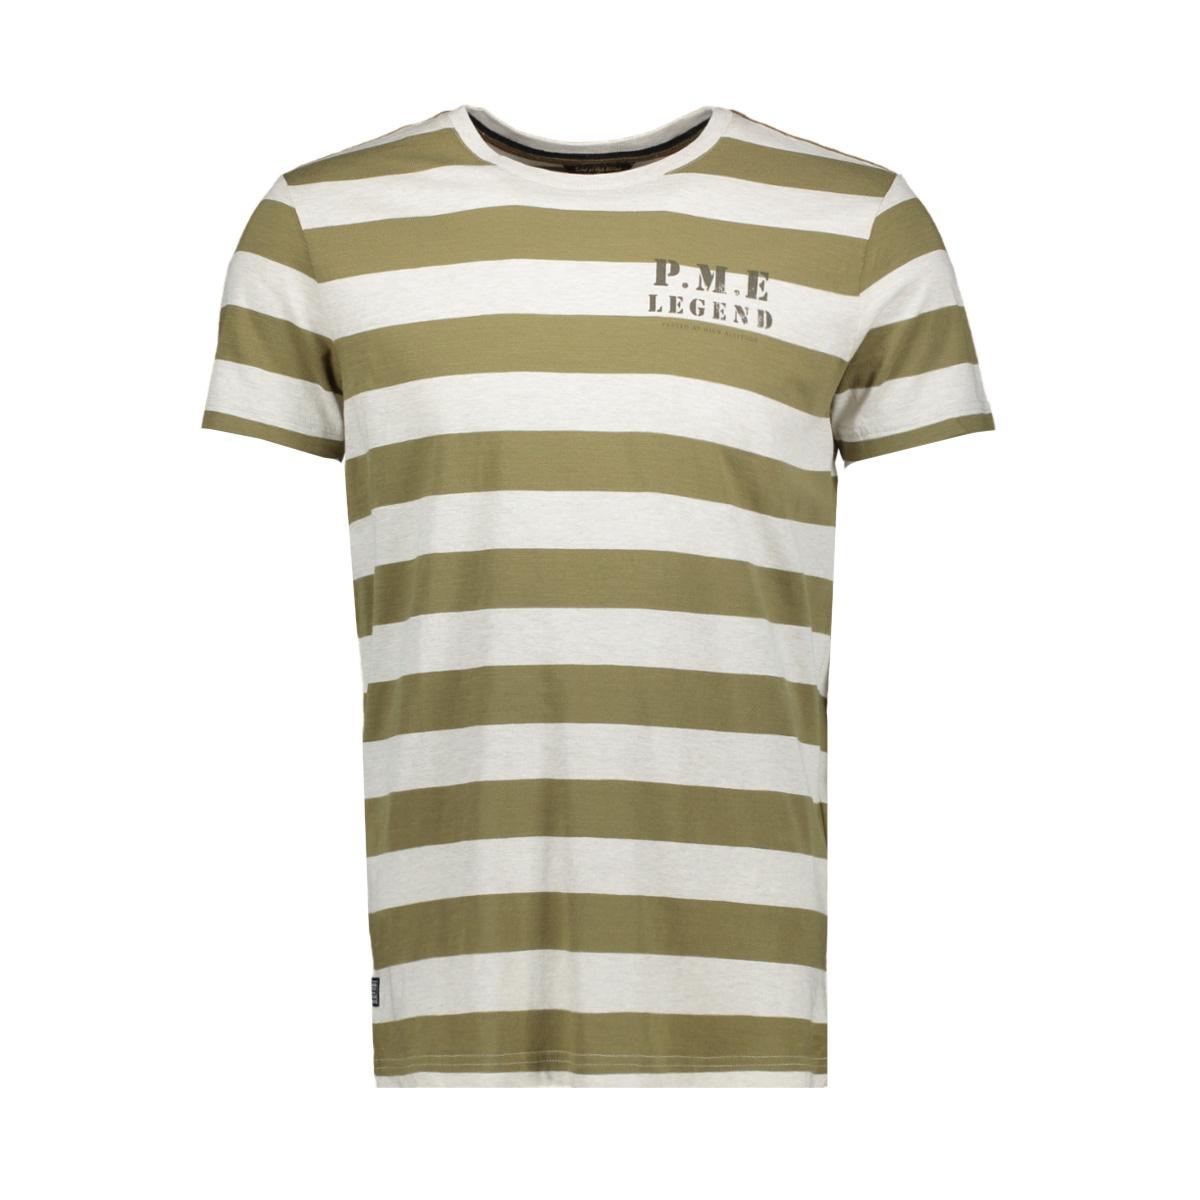 single jersey artwork tshirt ptss193545 pme legend t-shirt 0910